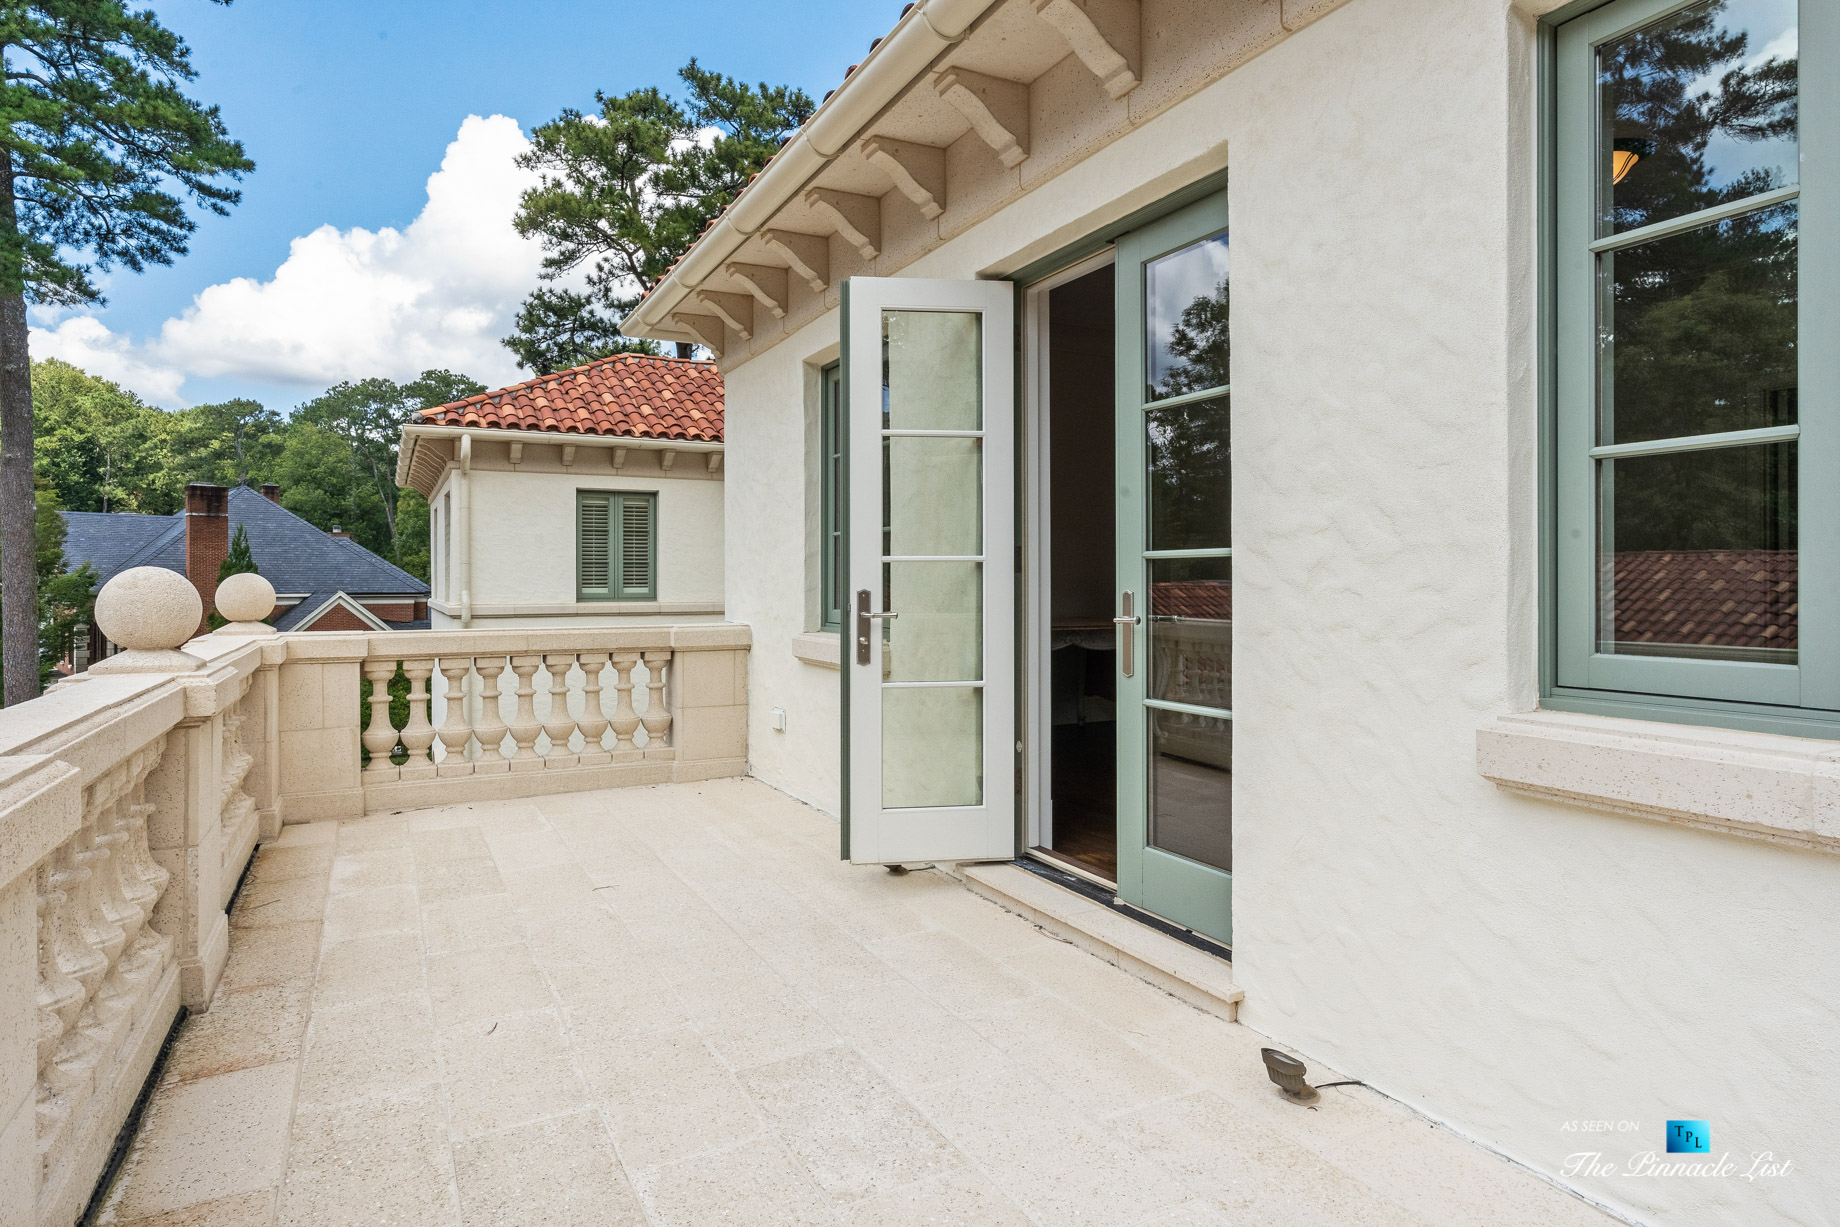 439 Blackland Rd NW, Atlanta, GA, USA – Private Balcony – Luxury Real Estate – Tuxedo Park Mediterranean Mansion Home